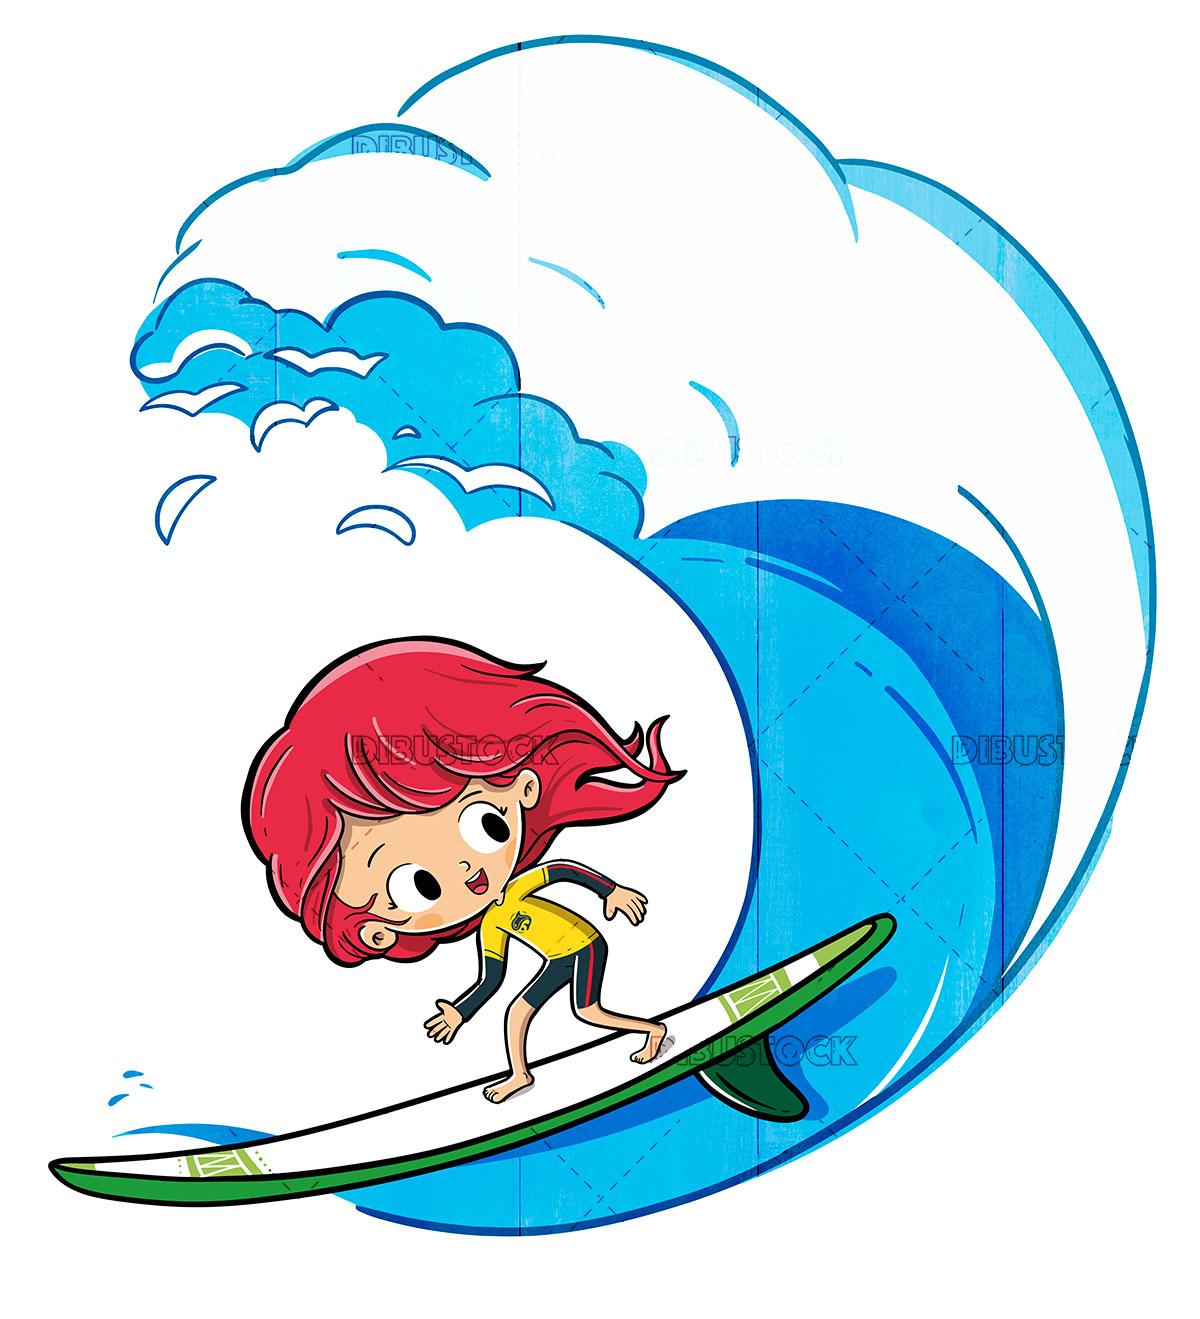 Boy surfing on a wave